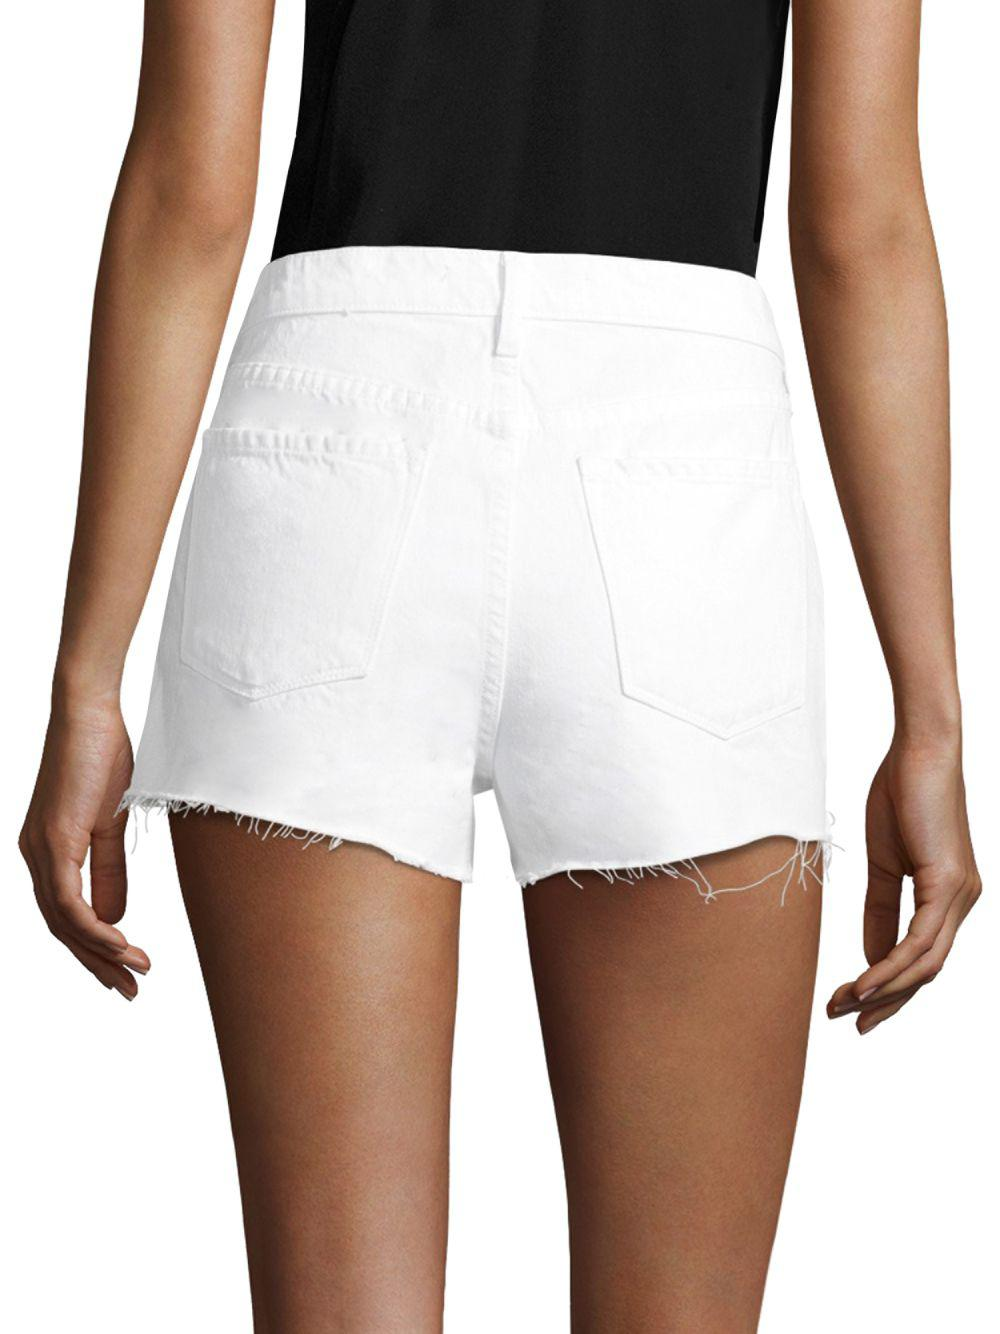 bd7bb7d51 Lyst - J Brand Ex Cut-off Denim Shorts in White - Save 54%